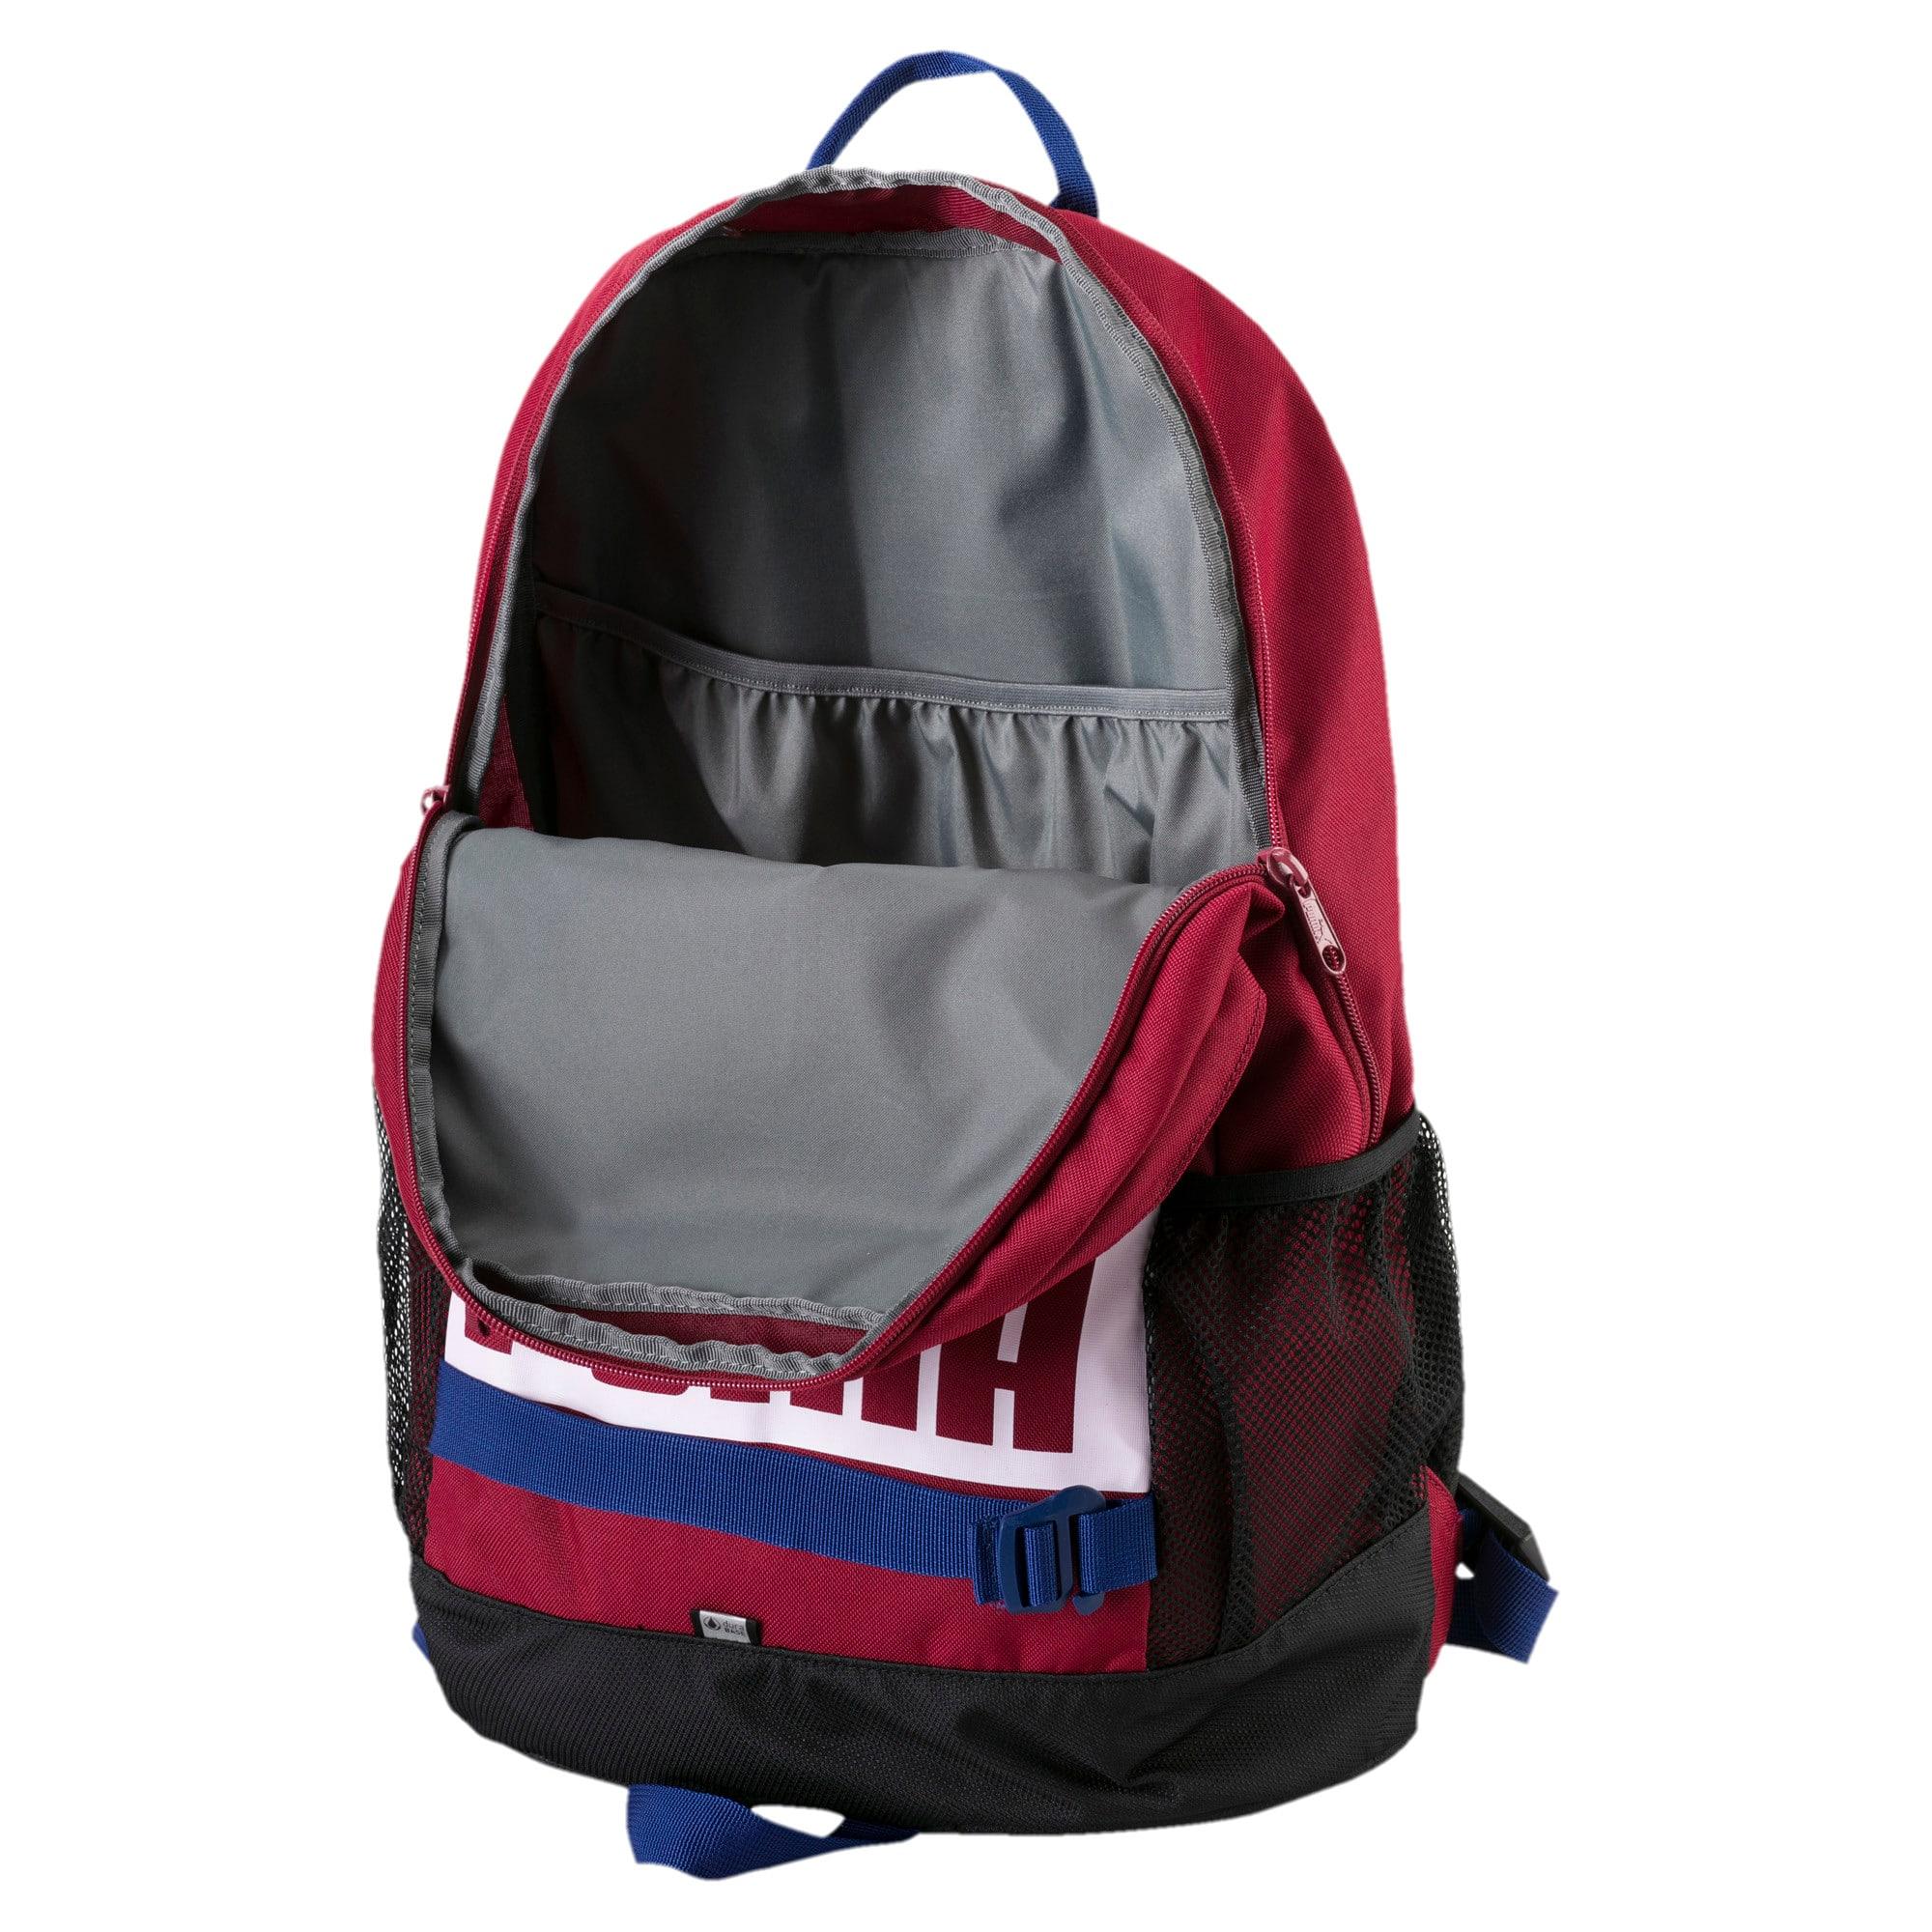 Thumbnail 3 of Deck Backpack, Tibetan Red, medium-IND